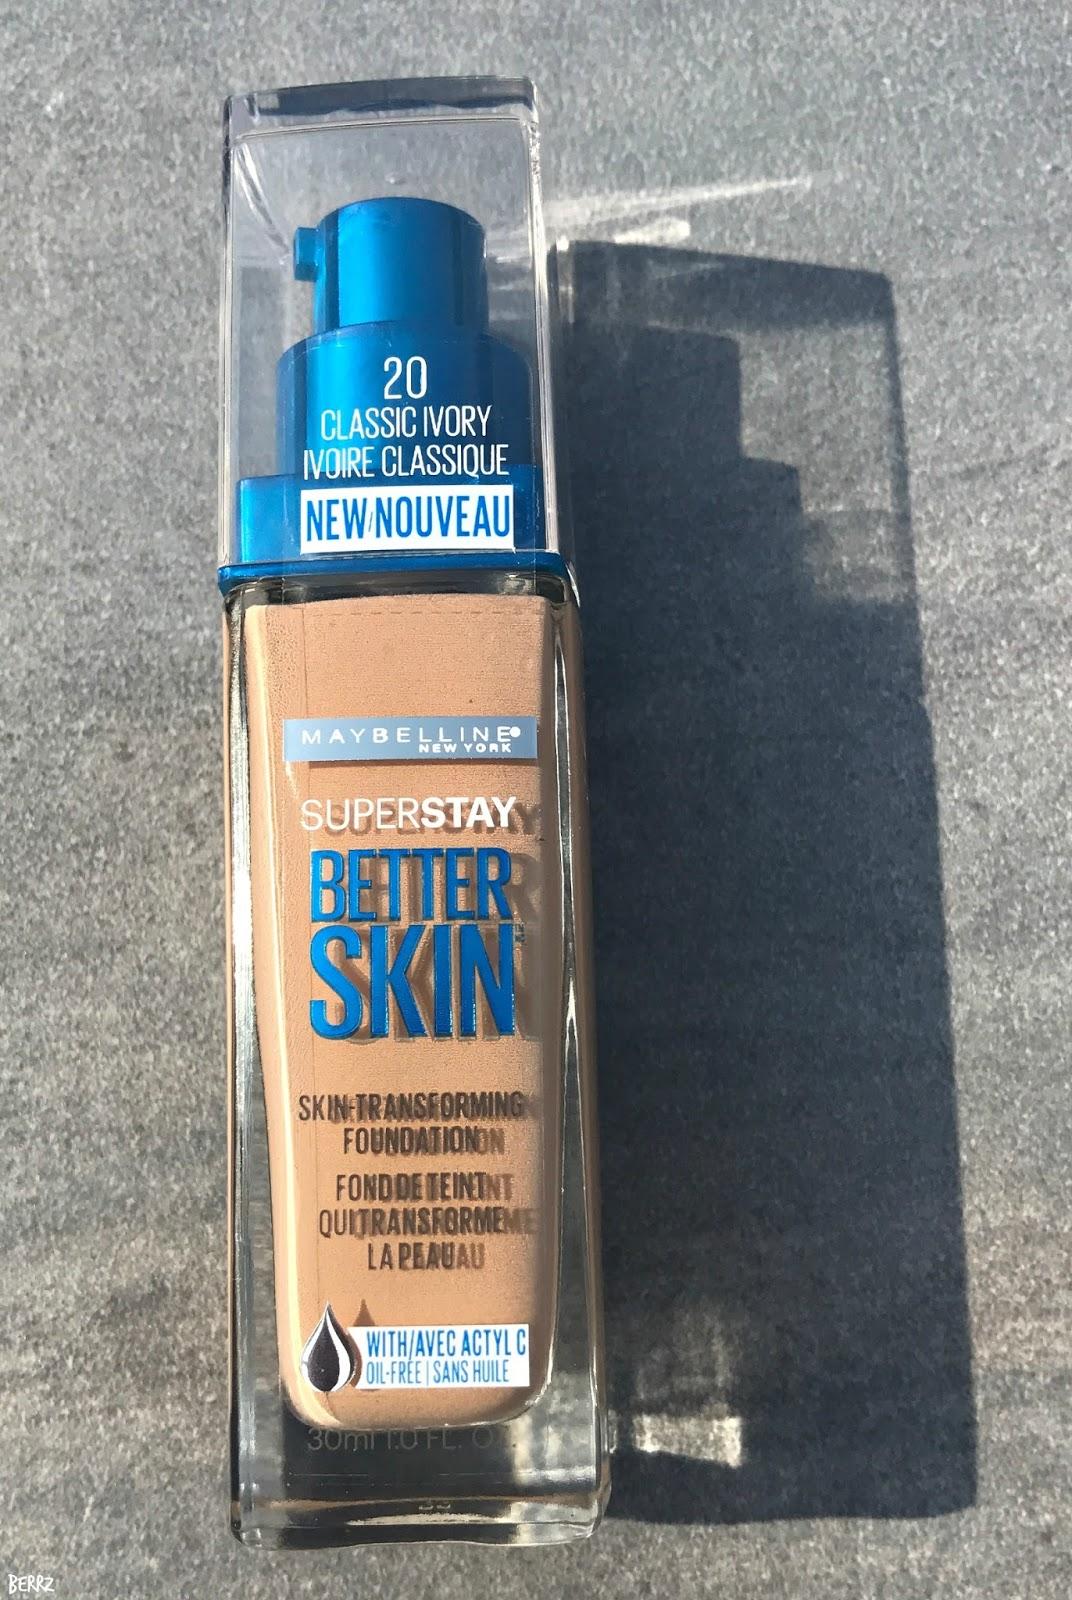 Superstay Better Skin Powder by Maybelline #21